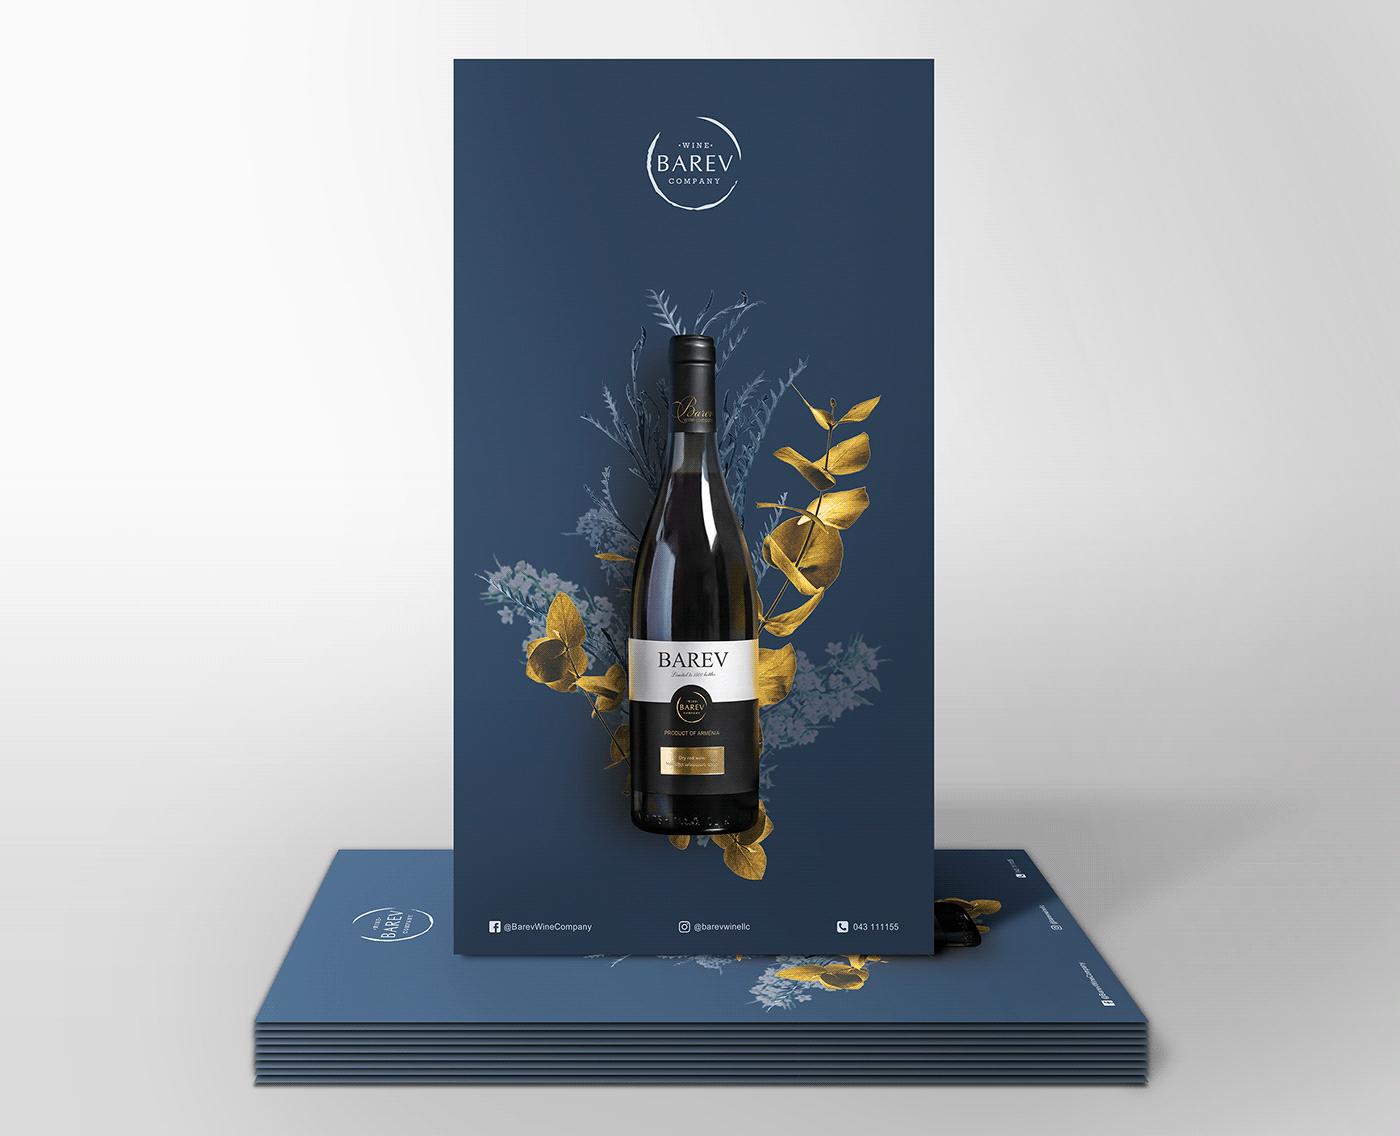 branding  design graphicdesign Catalogue businesscard banner poster